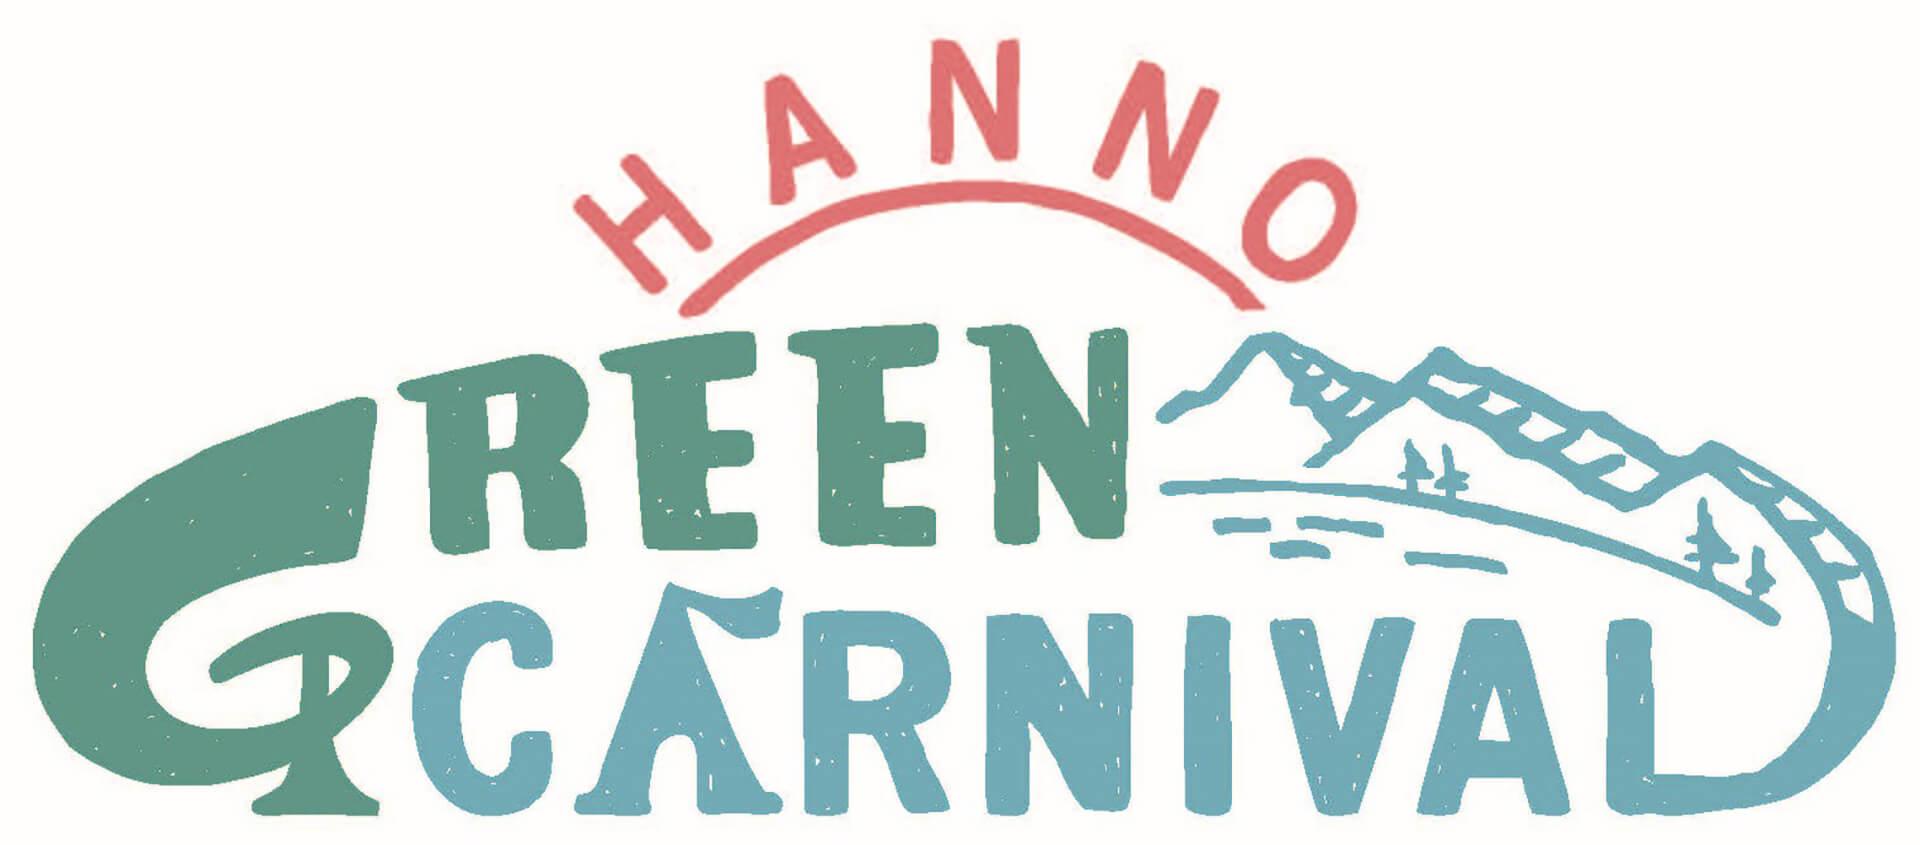 Hanno Green Carnival 2020 ~マナブ、 アソブ、 ツナガル。 ~